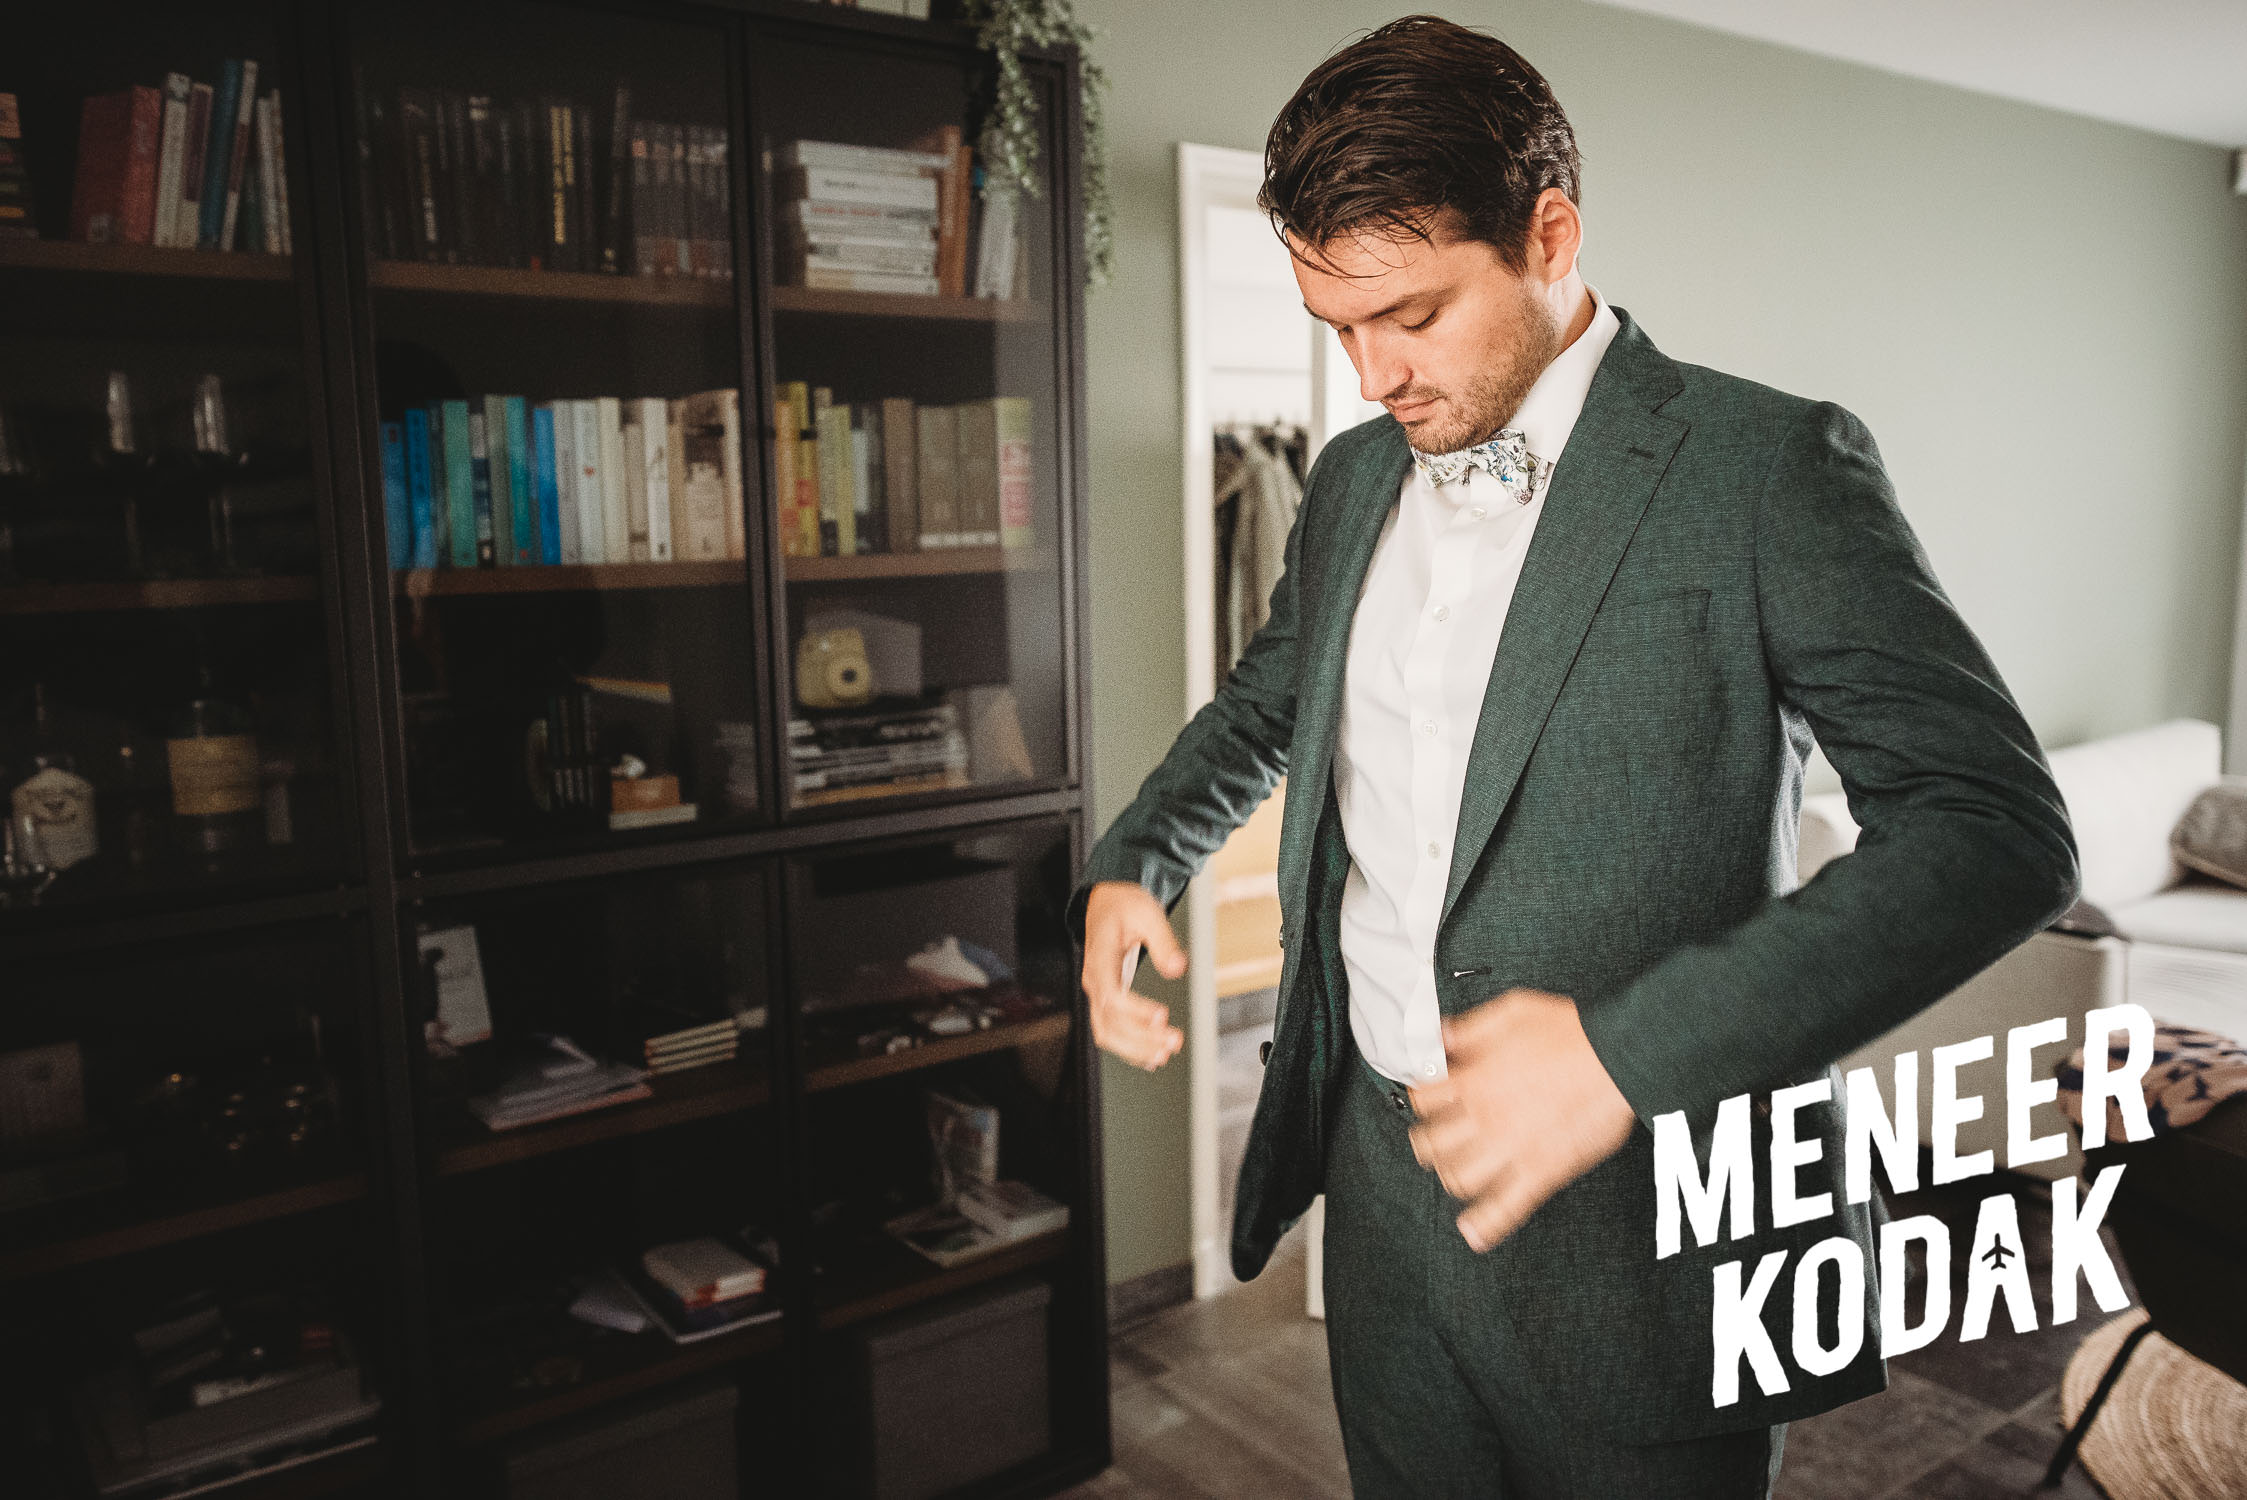 Meneer Kodak - Trouwreportage - Breda - E&M-061.jpg